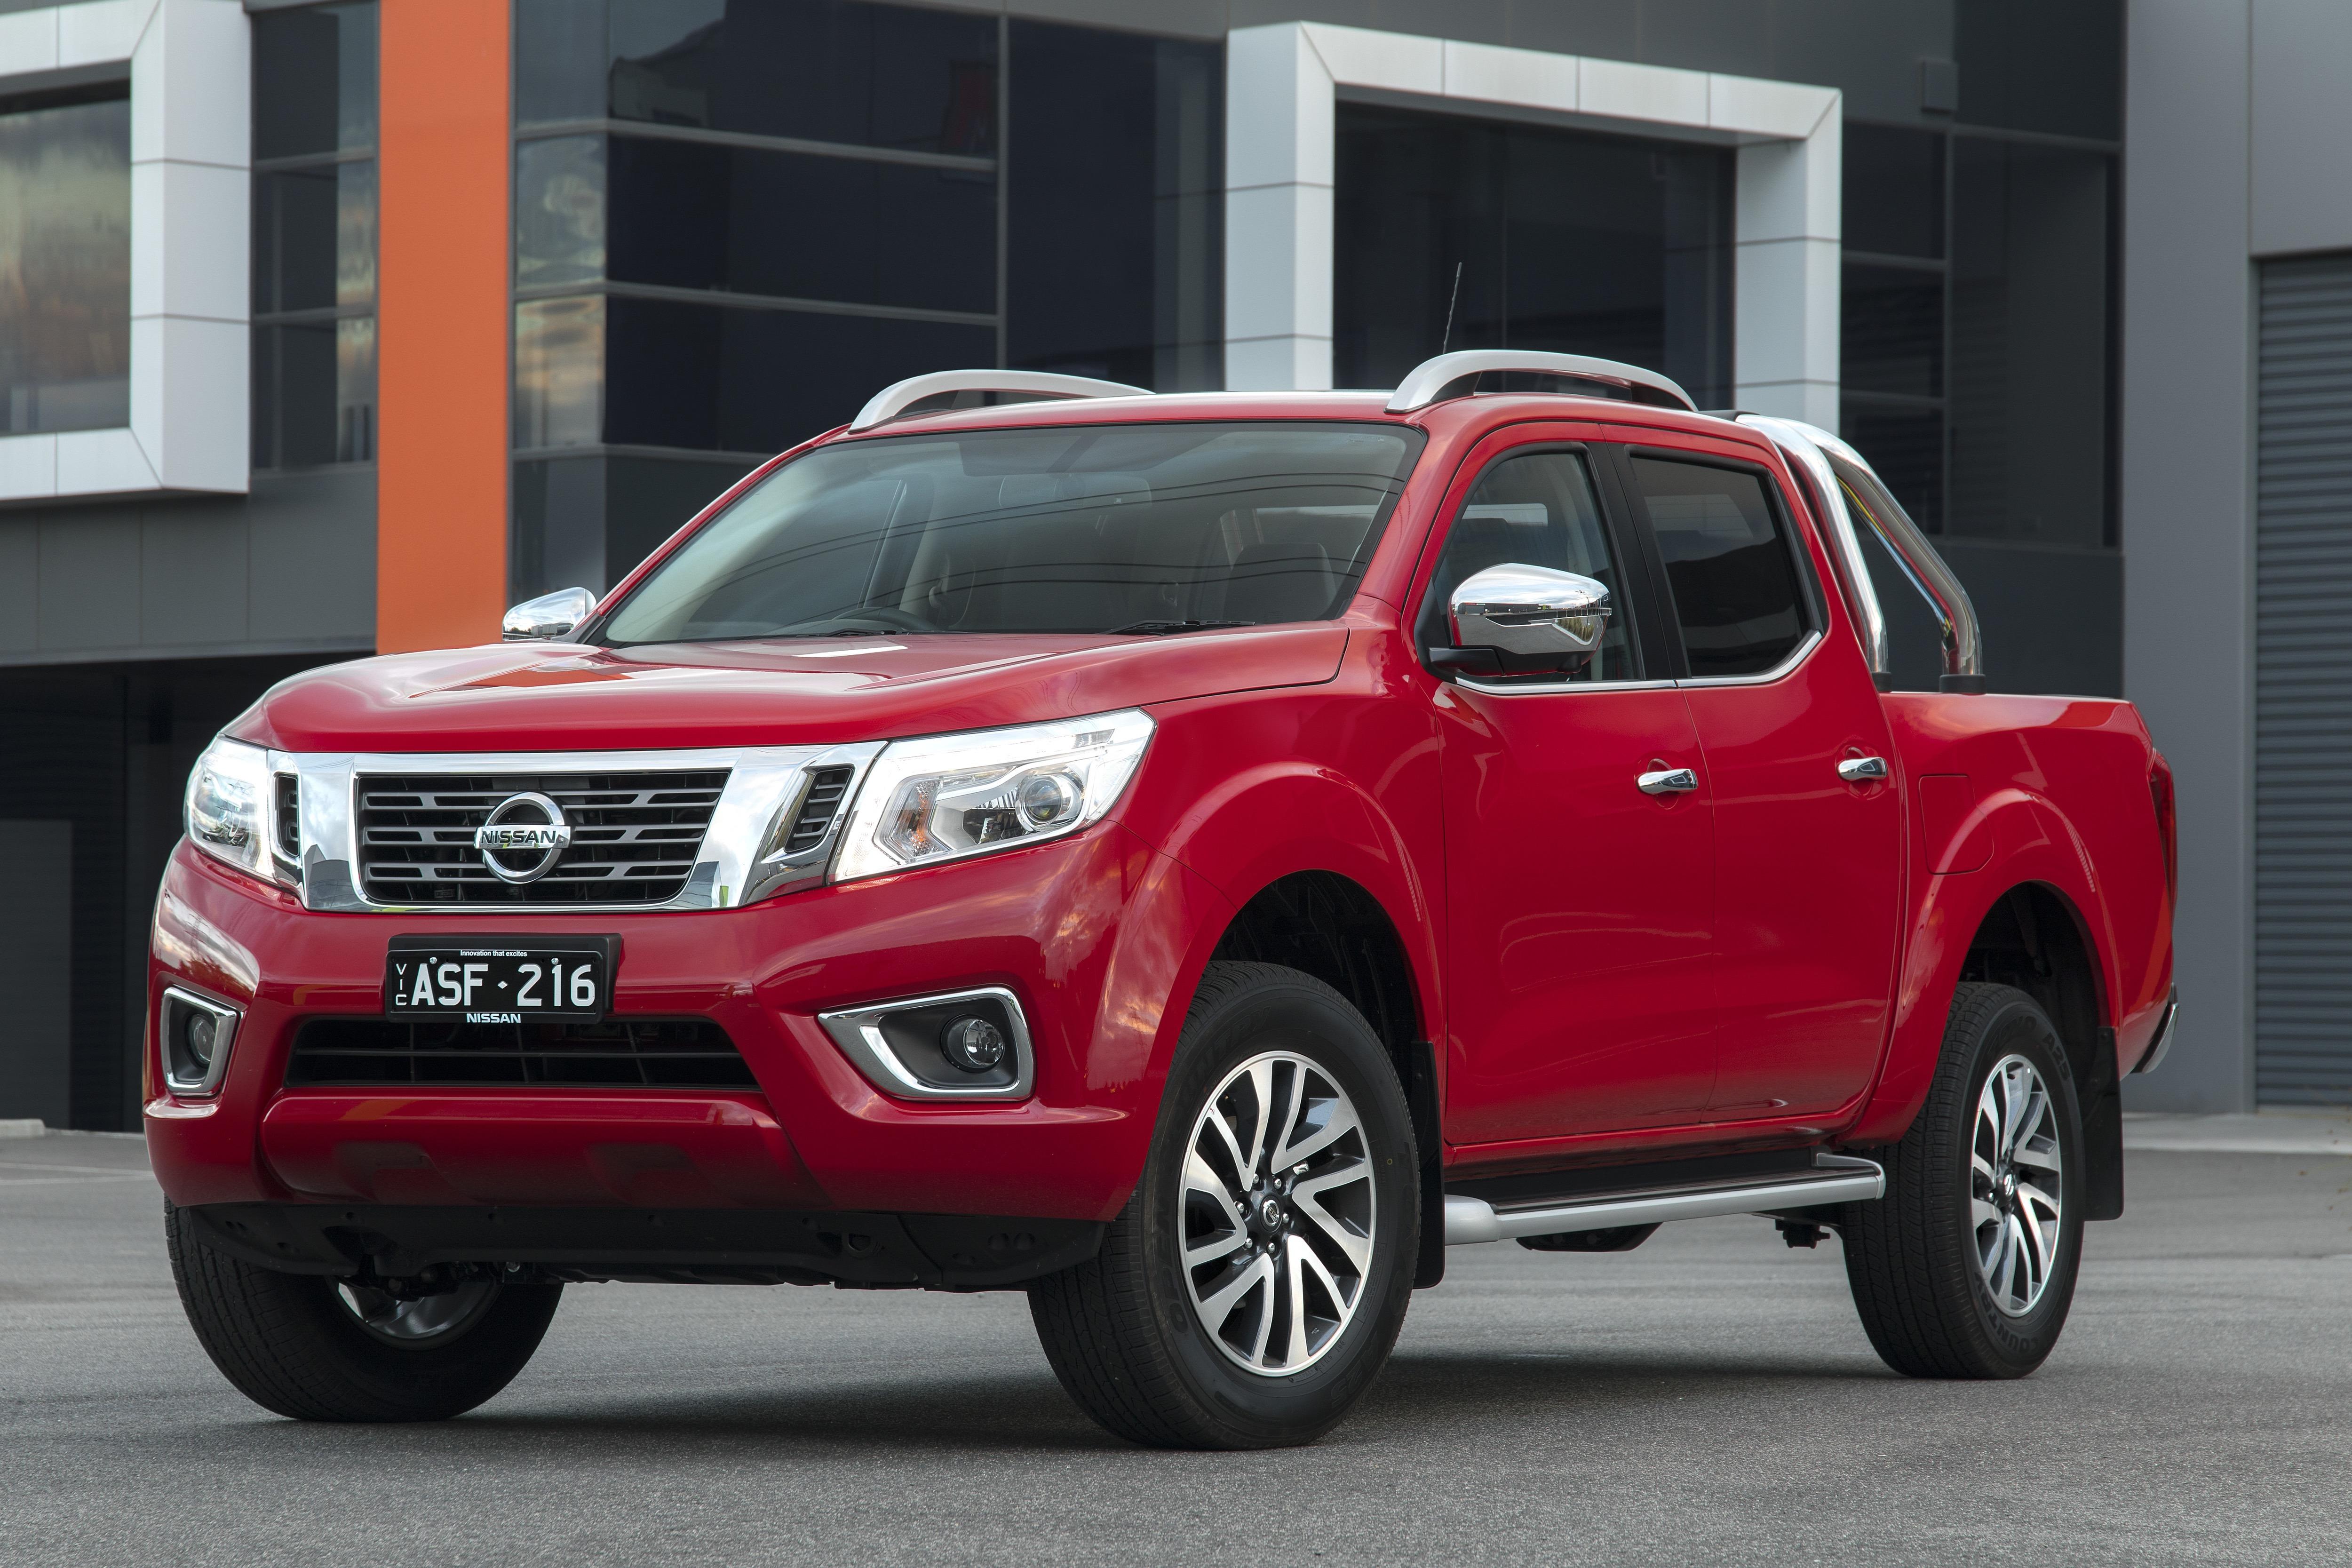 2018 Nissan Navara ST-X new car review